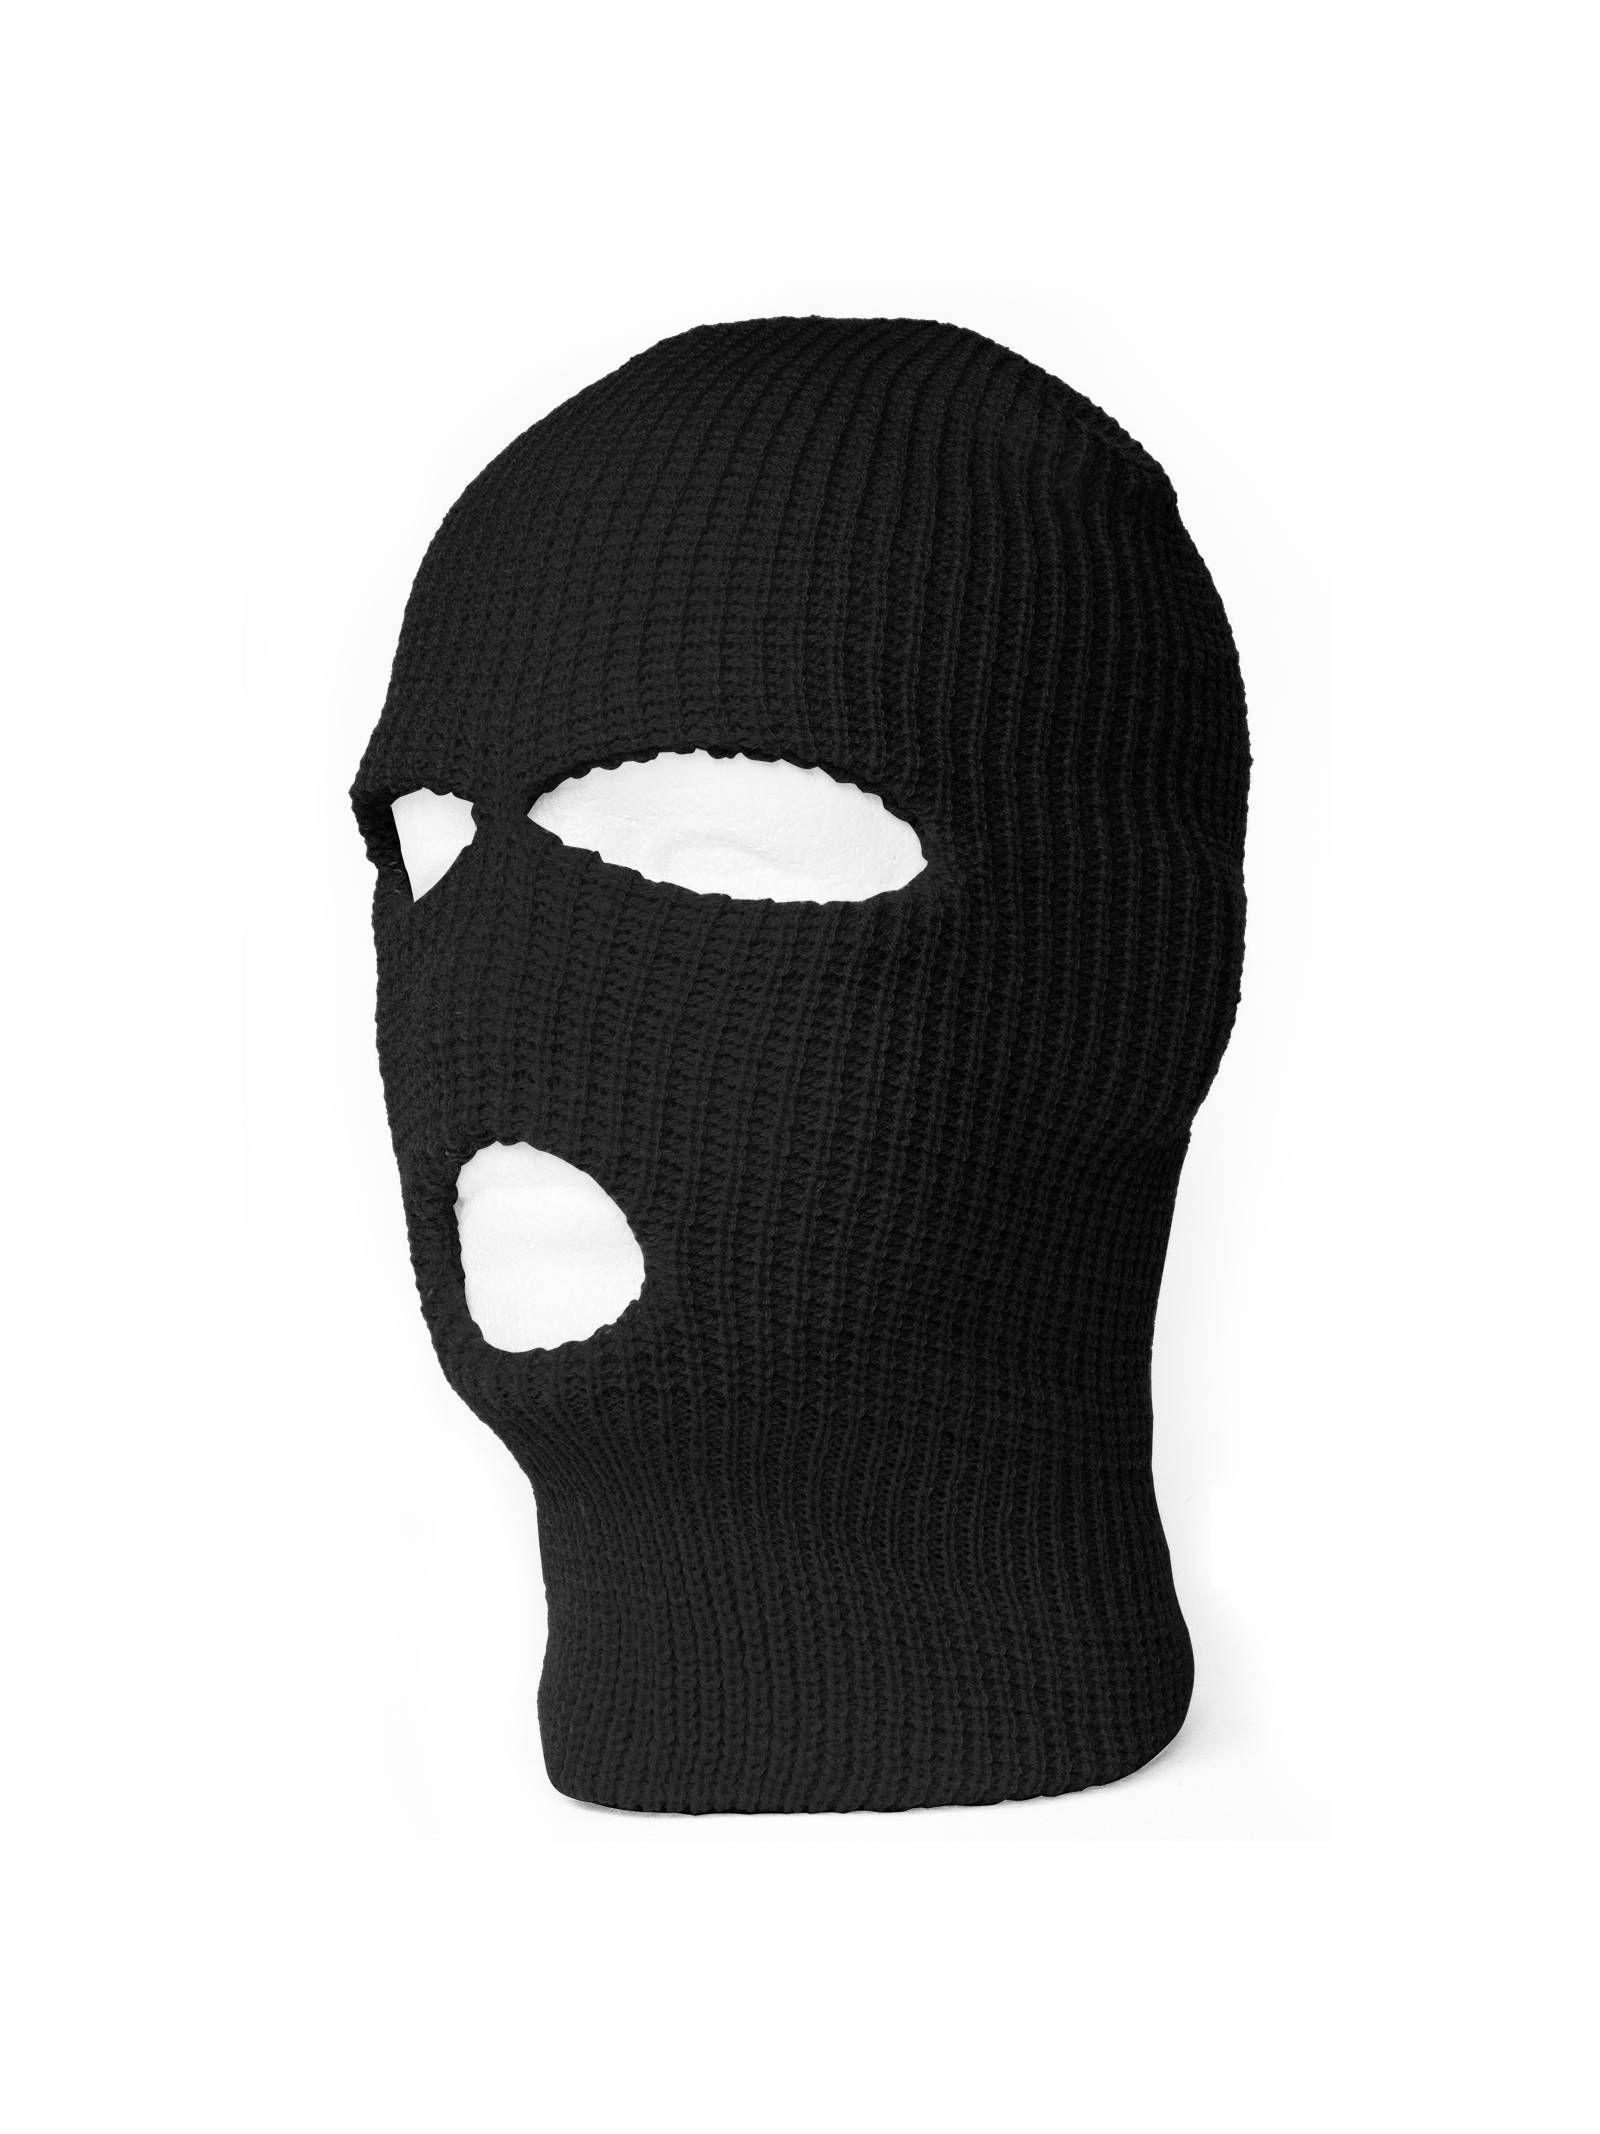 Topheadwear S 3 Hole Face Ski Mask Black 1pc Walmart Com Ski Mask Skiing Balaclava